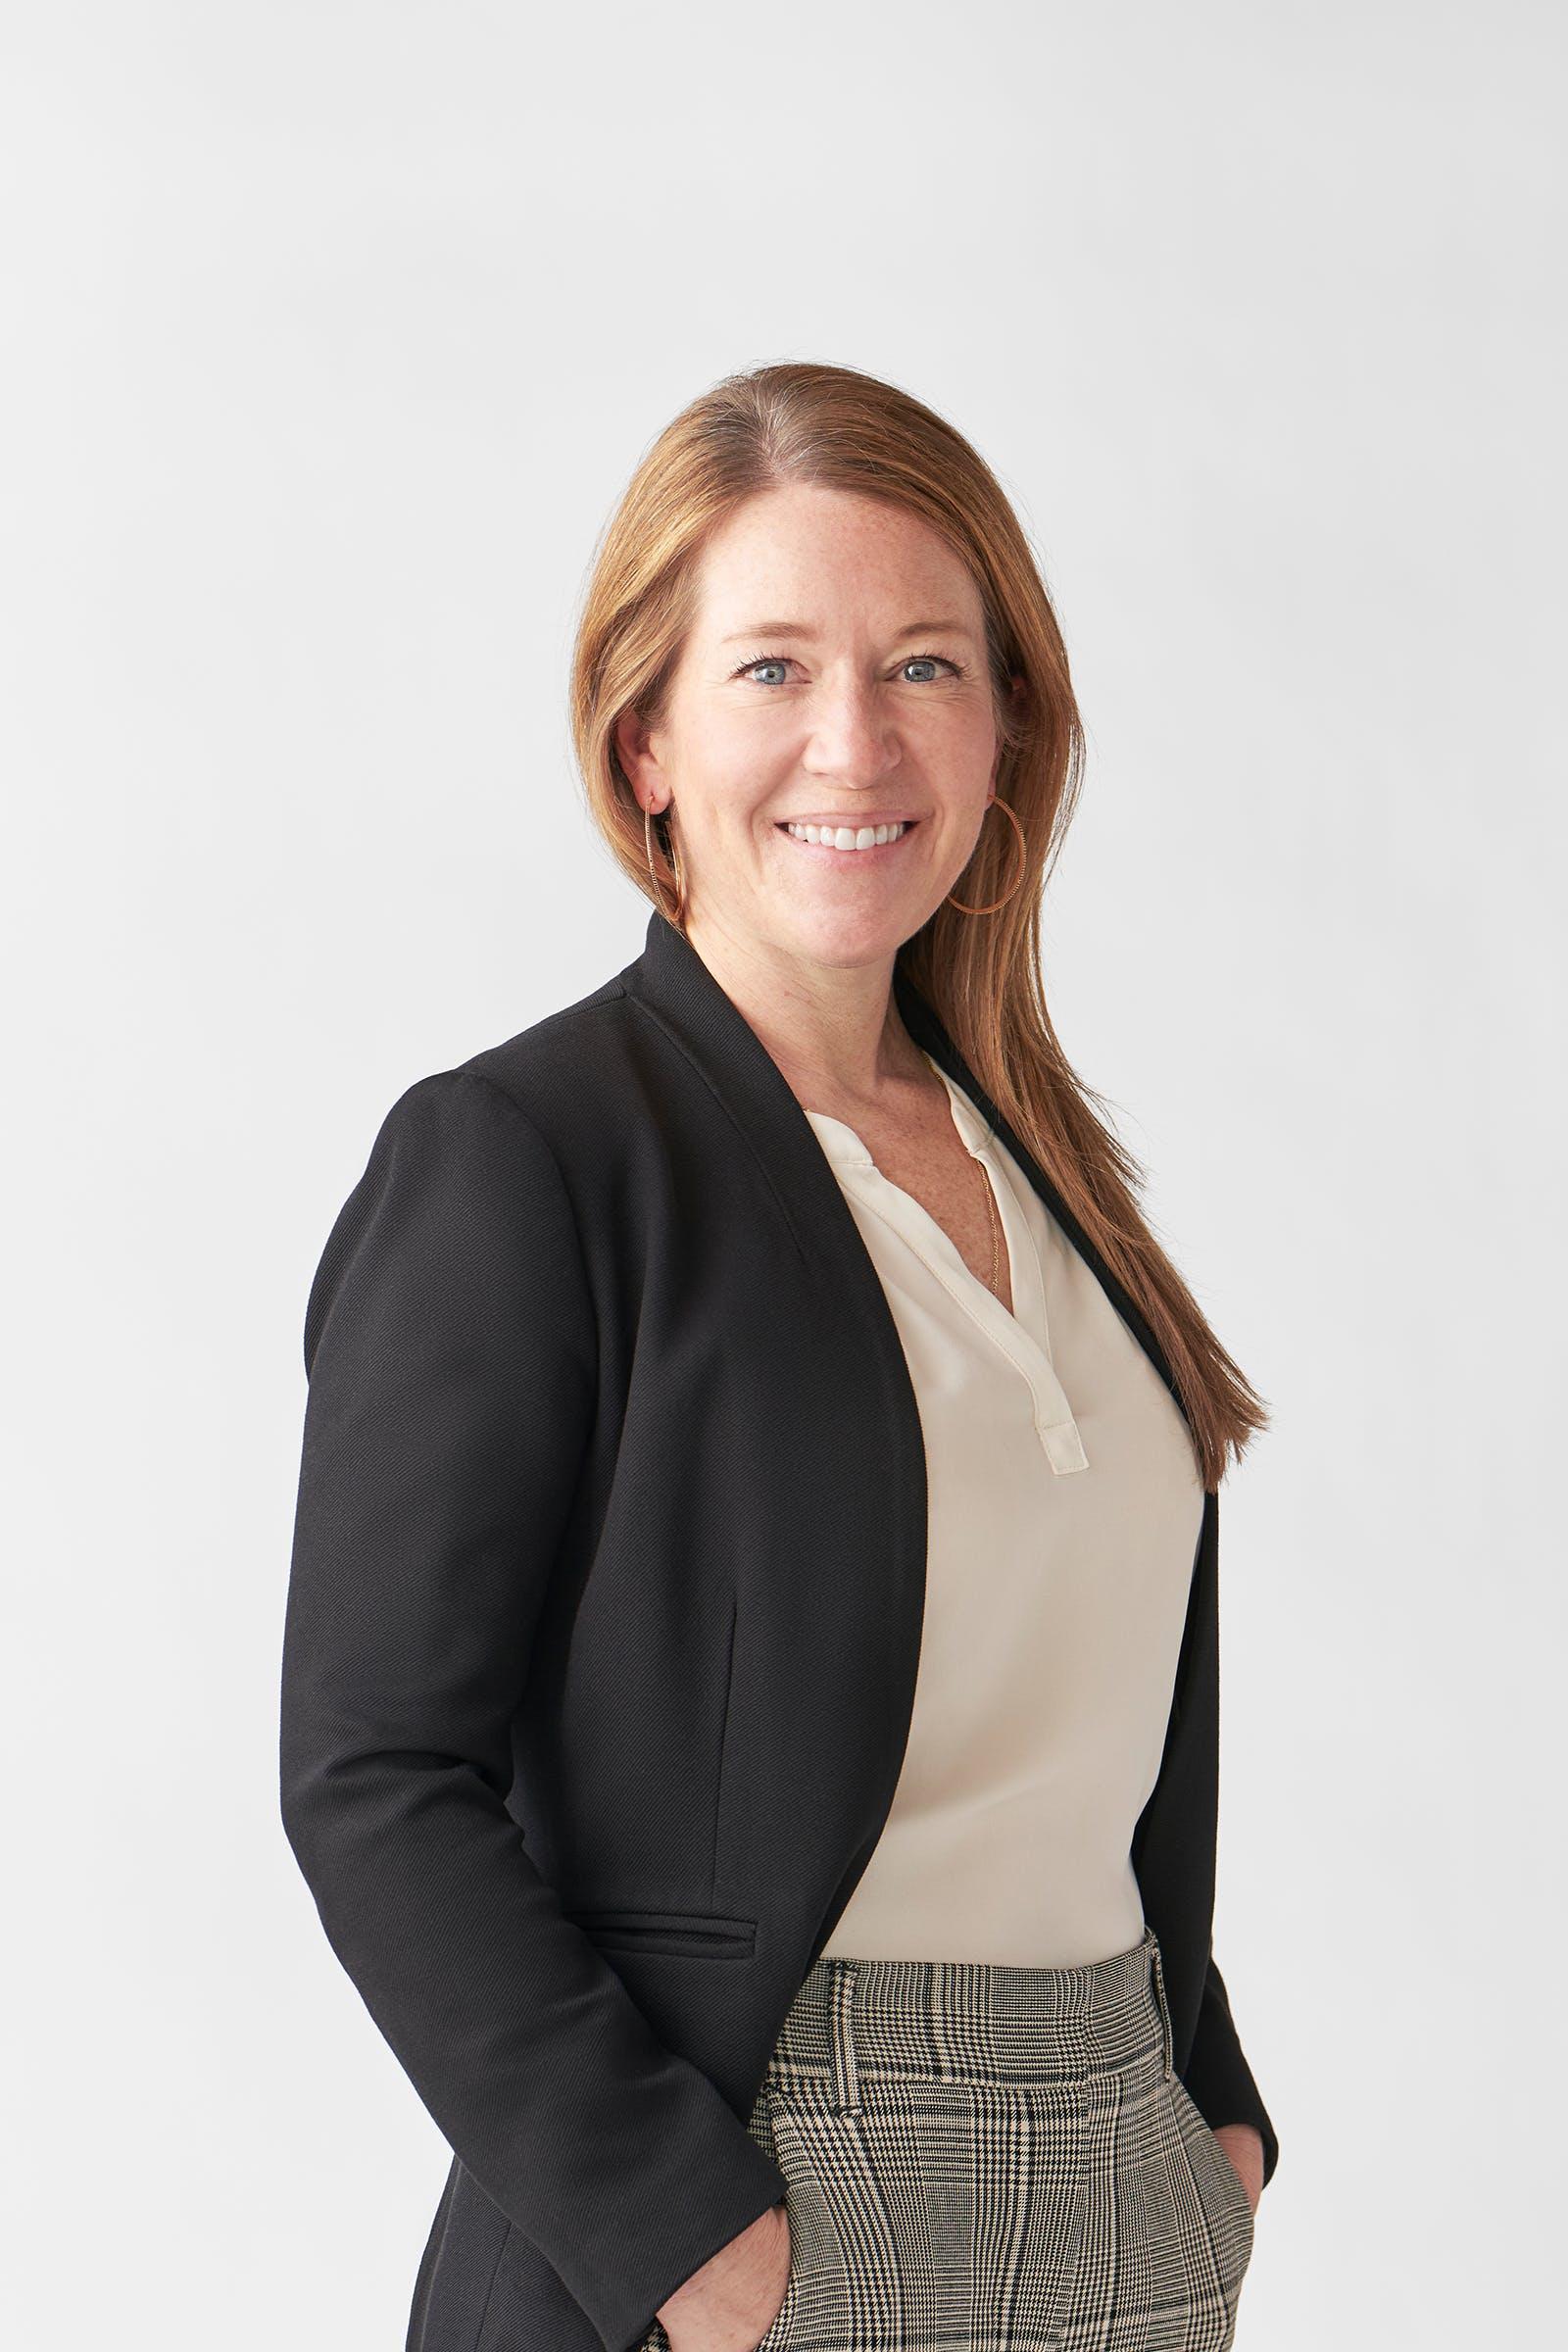 Allison Lowrie, CMO